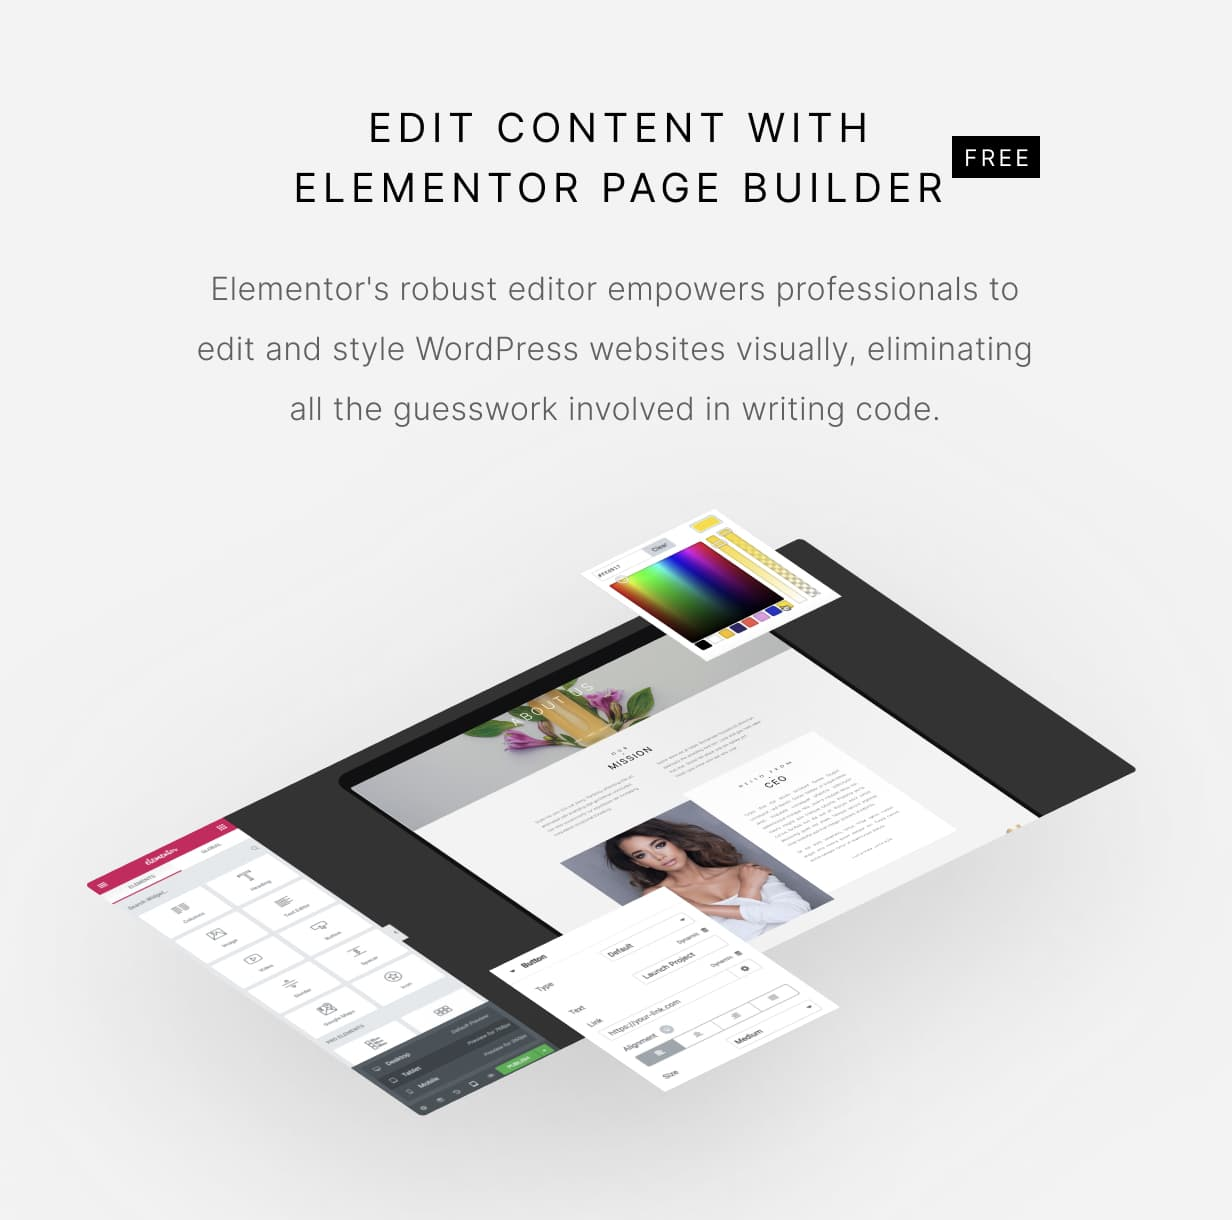 Luchiana - Elementor Page Builder